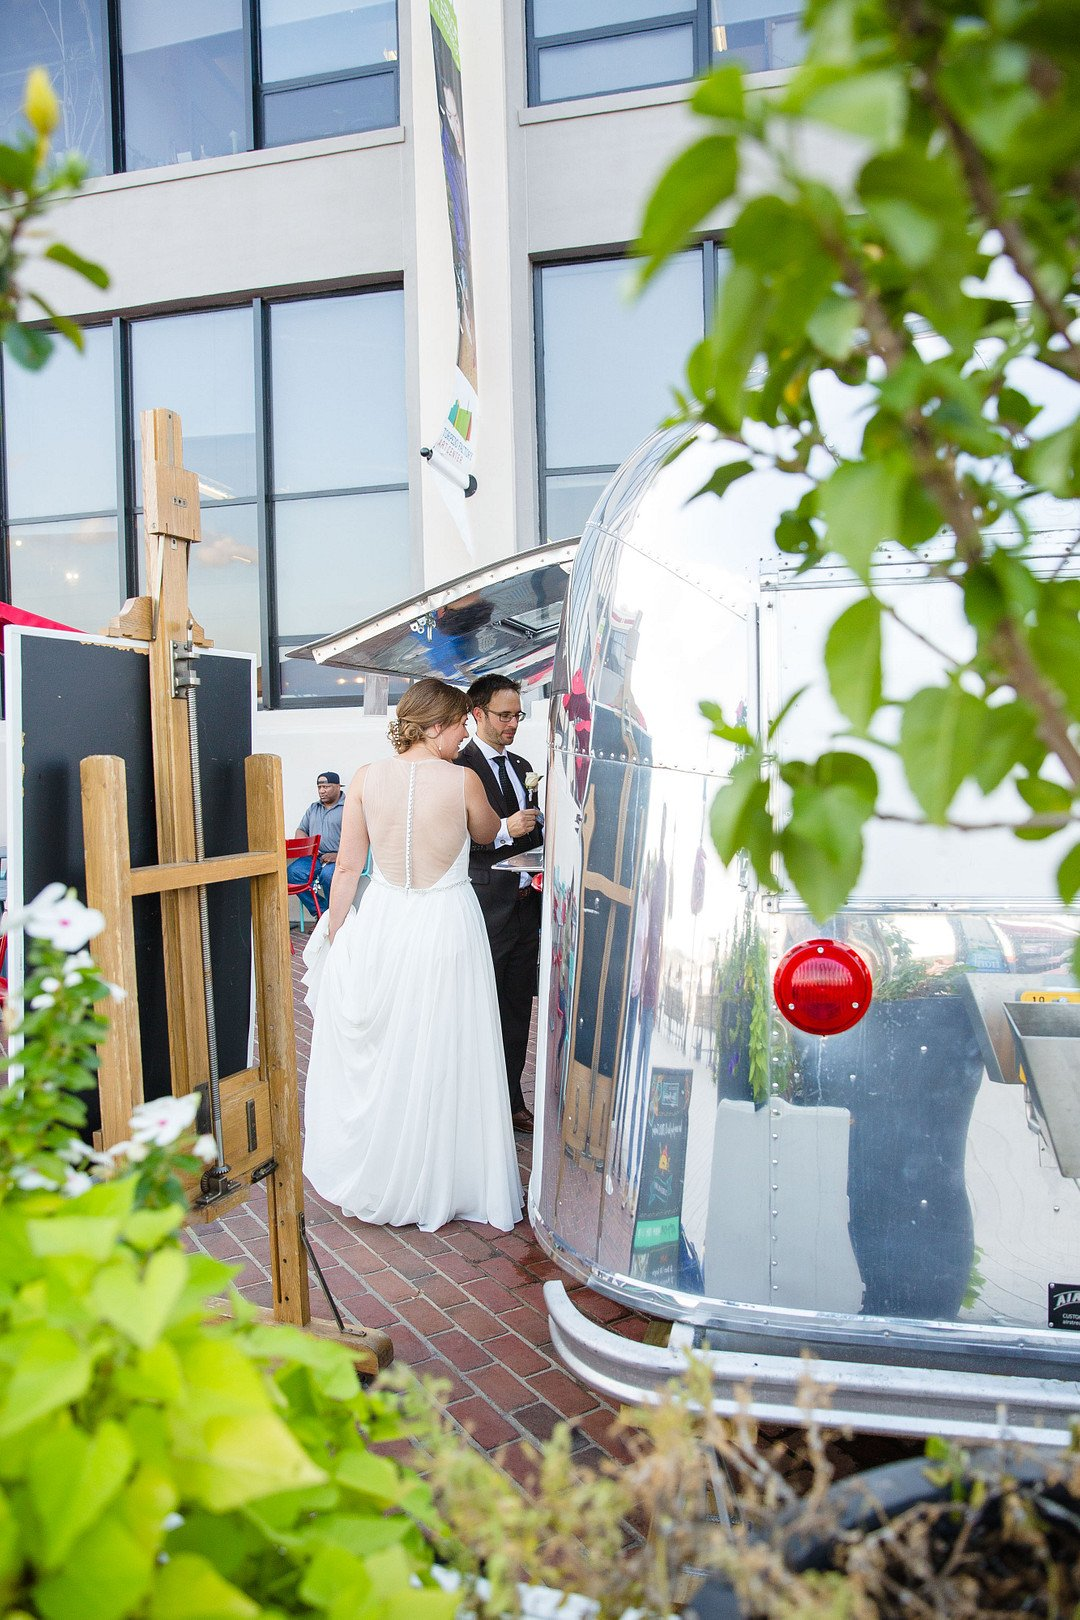 Deupree_Iorio_Megan Rei Photography_carlyle-house-wedding-megan-rei-photography-47_low